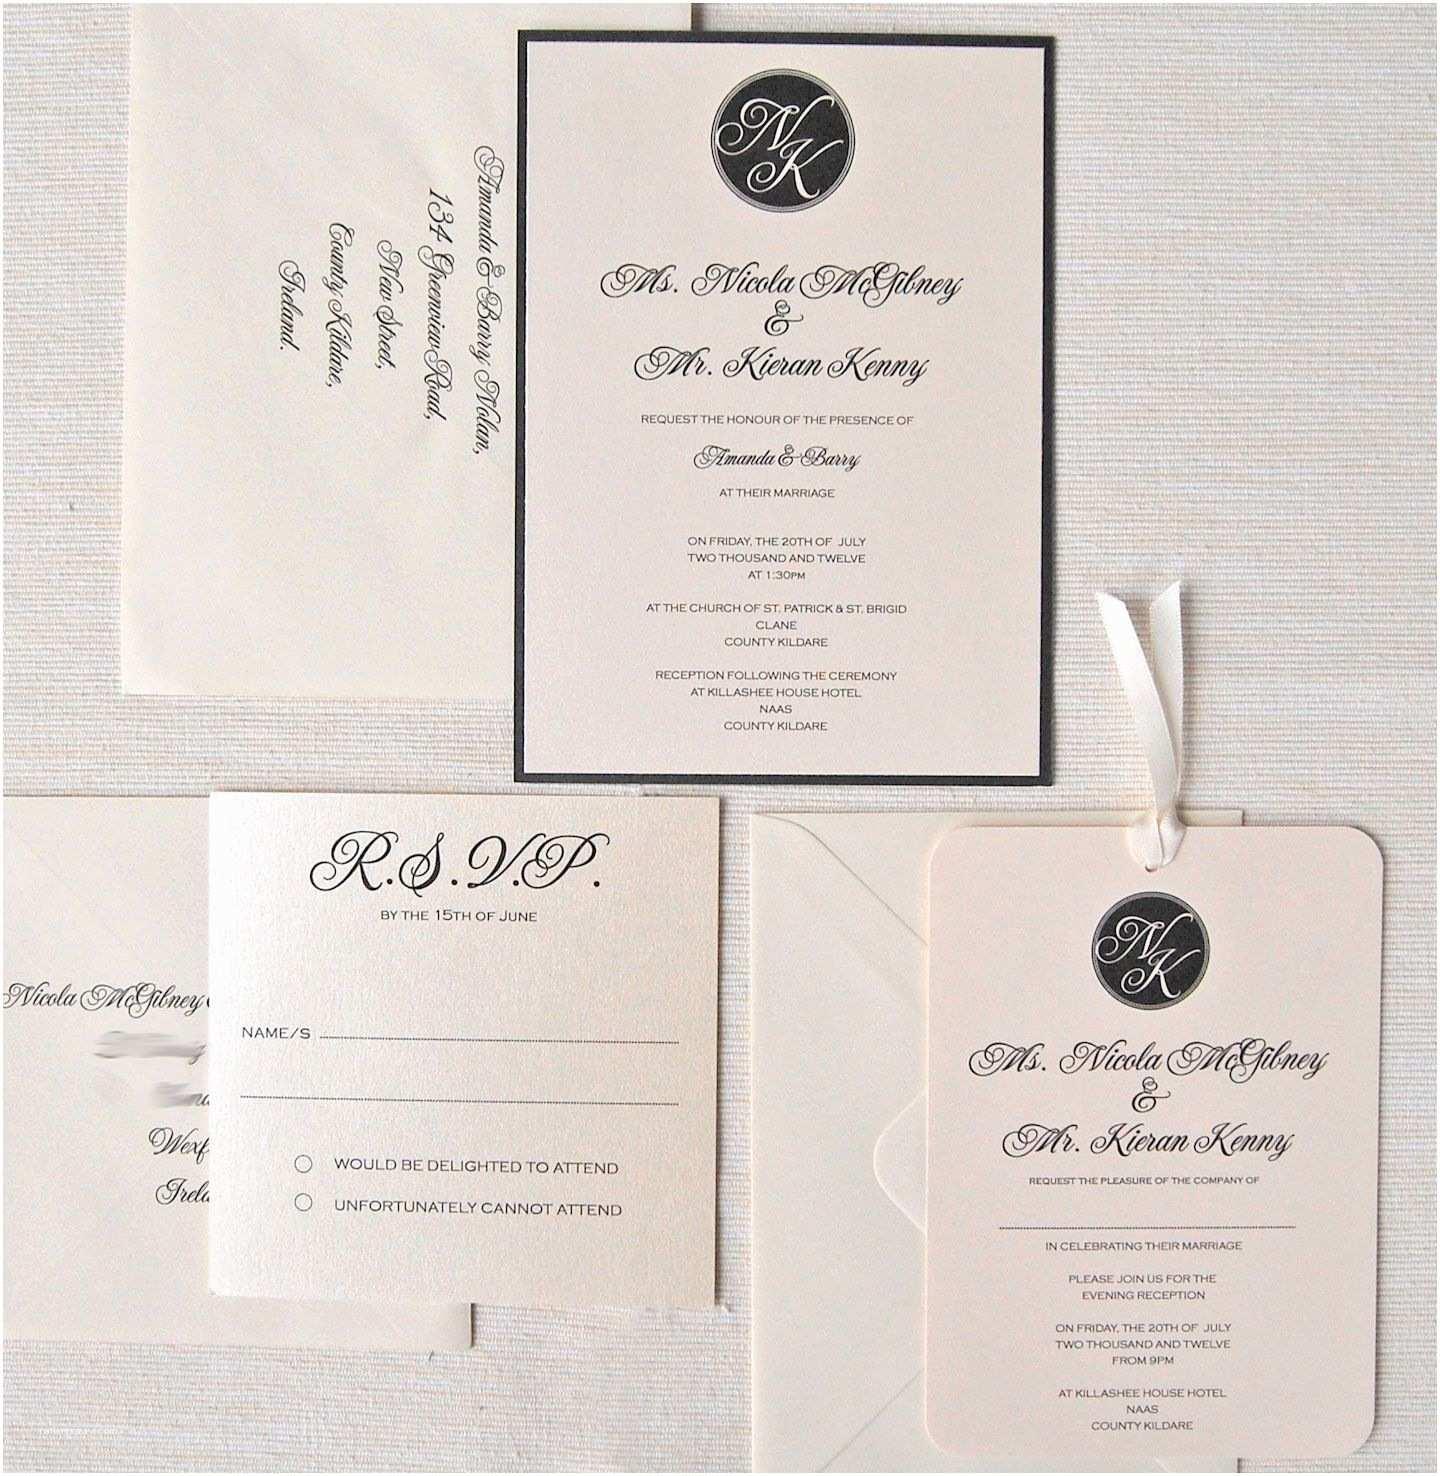 Wedding Invitation Response Wedding Invitations Response Cards Wedding Invitations